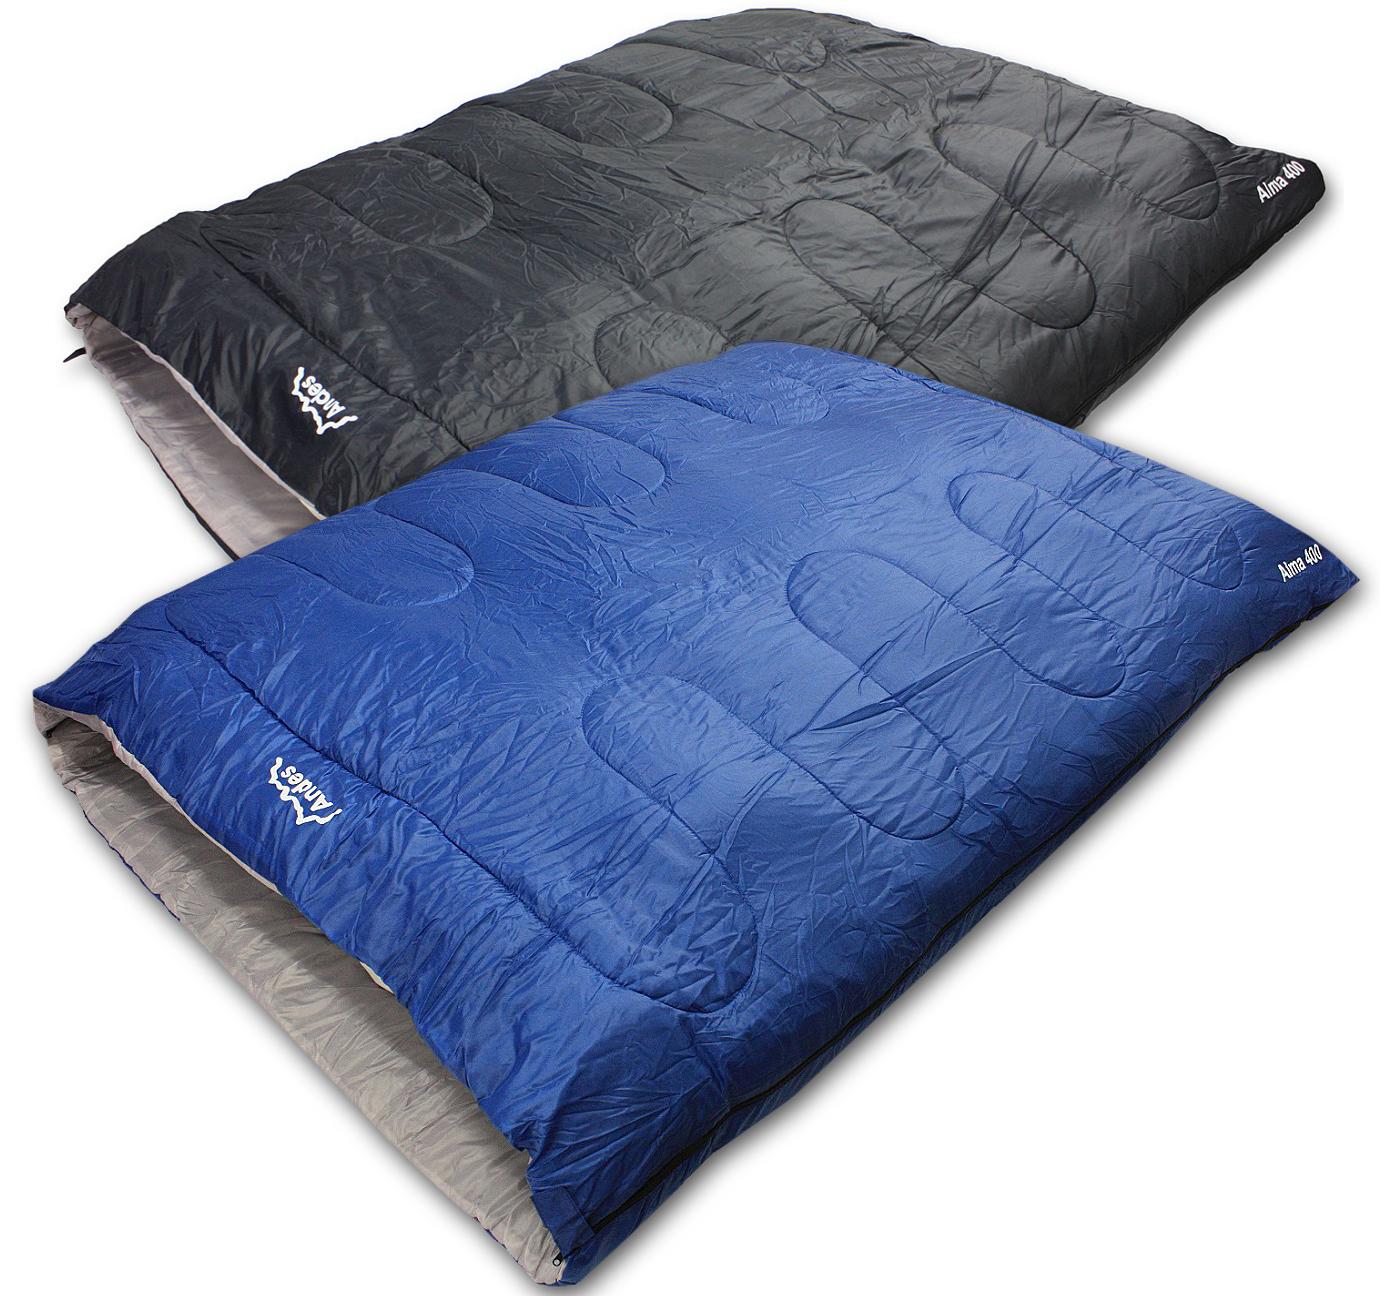 Andes Alma 400 Double Sleeping Bag